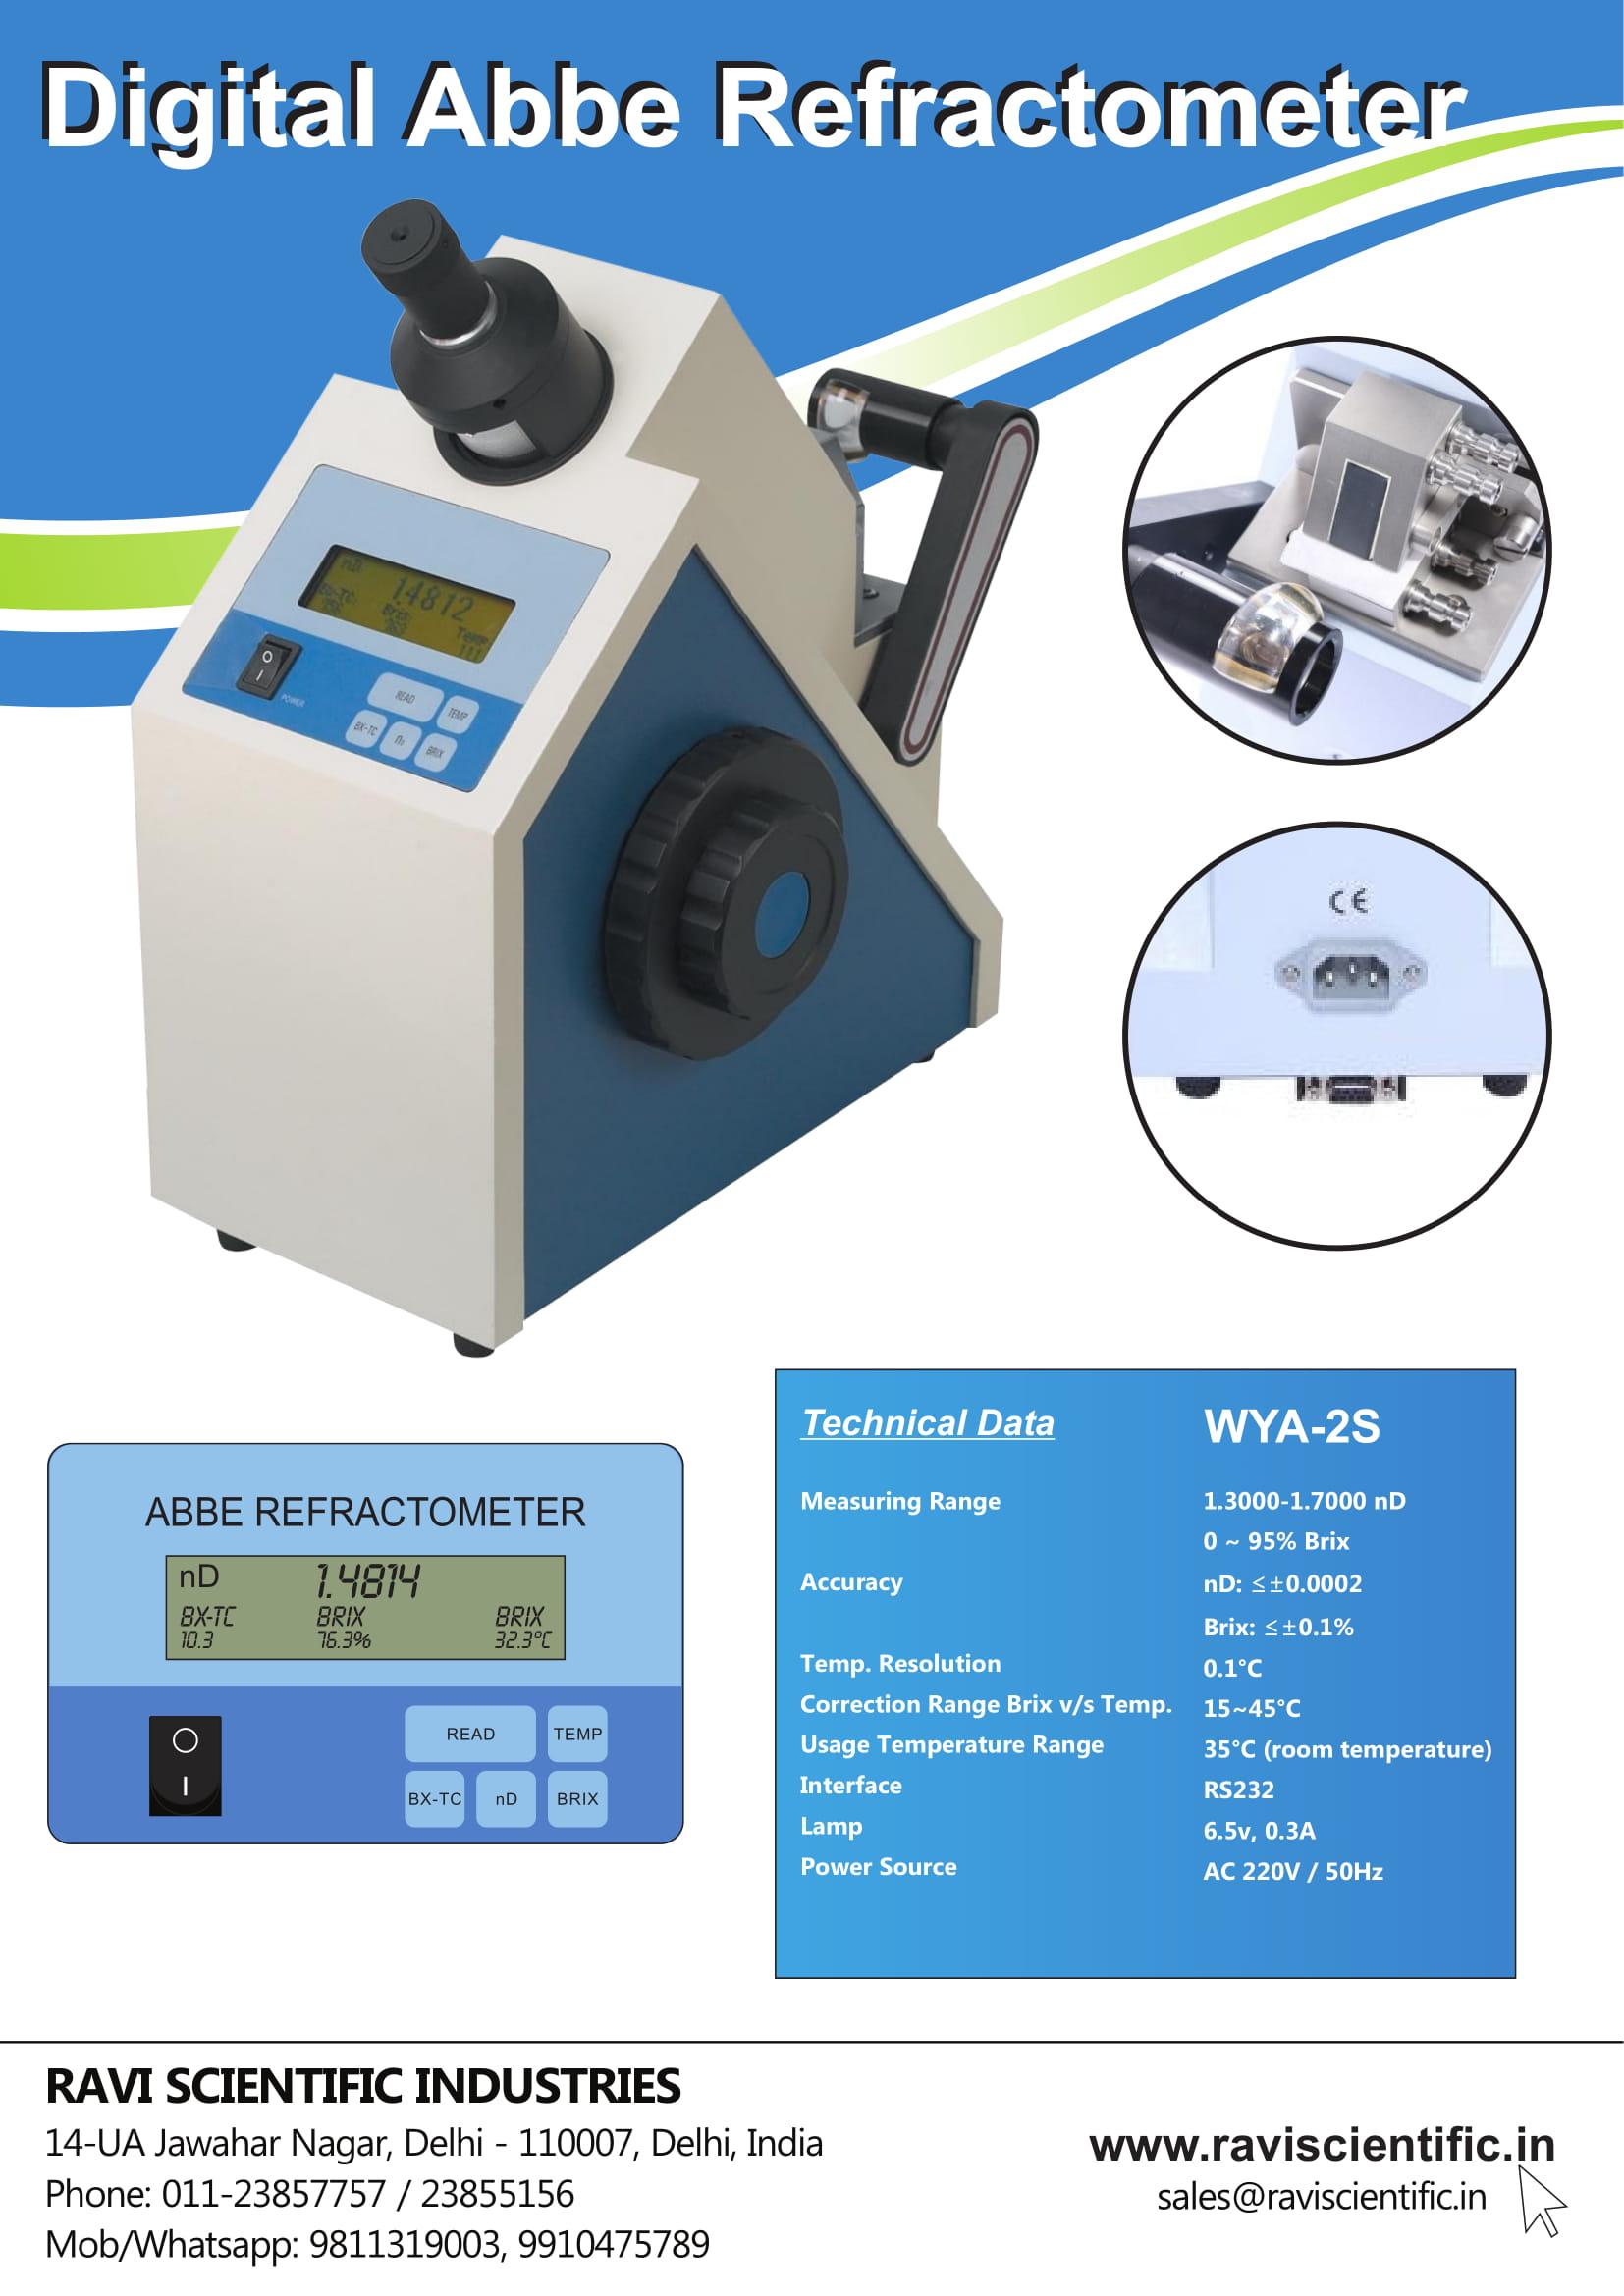 Digital Abbe Refractometer WYA-2S Pamphlet